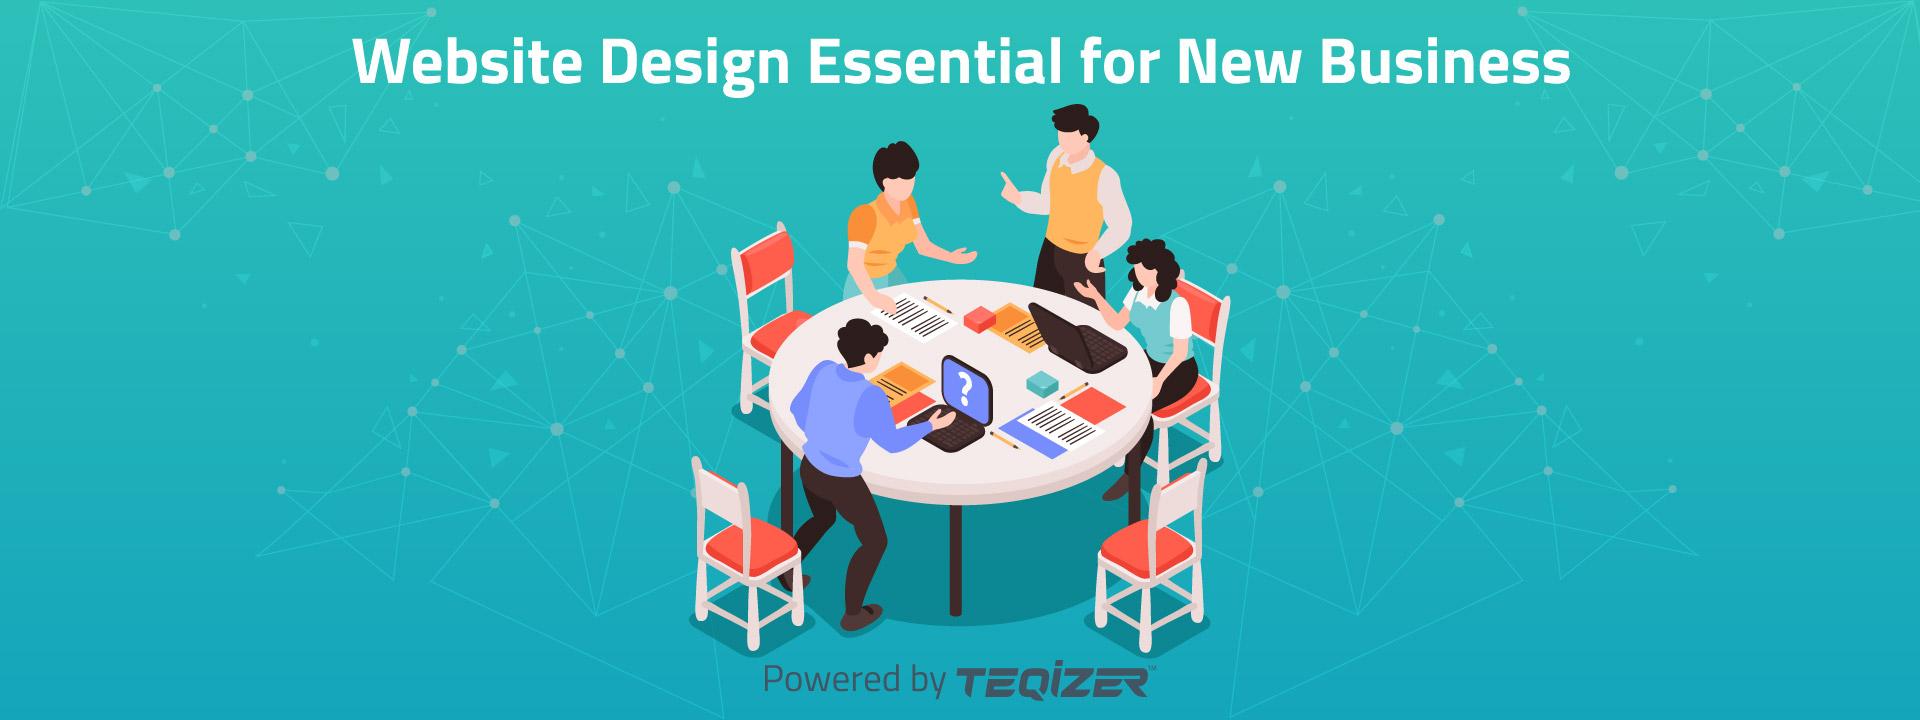 Website Design essential for New Business